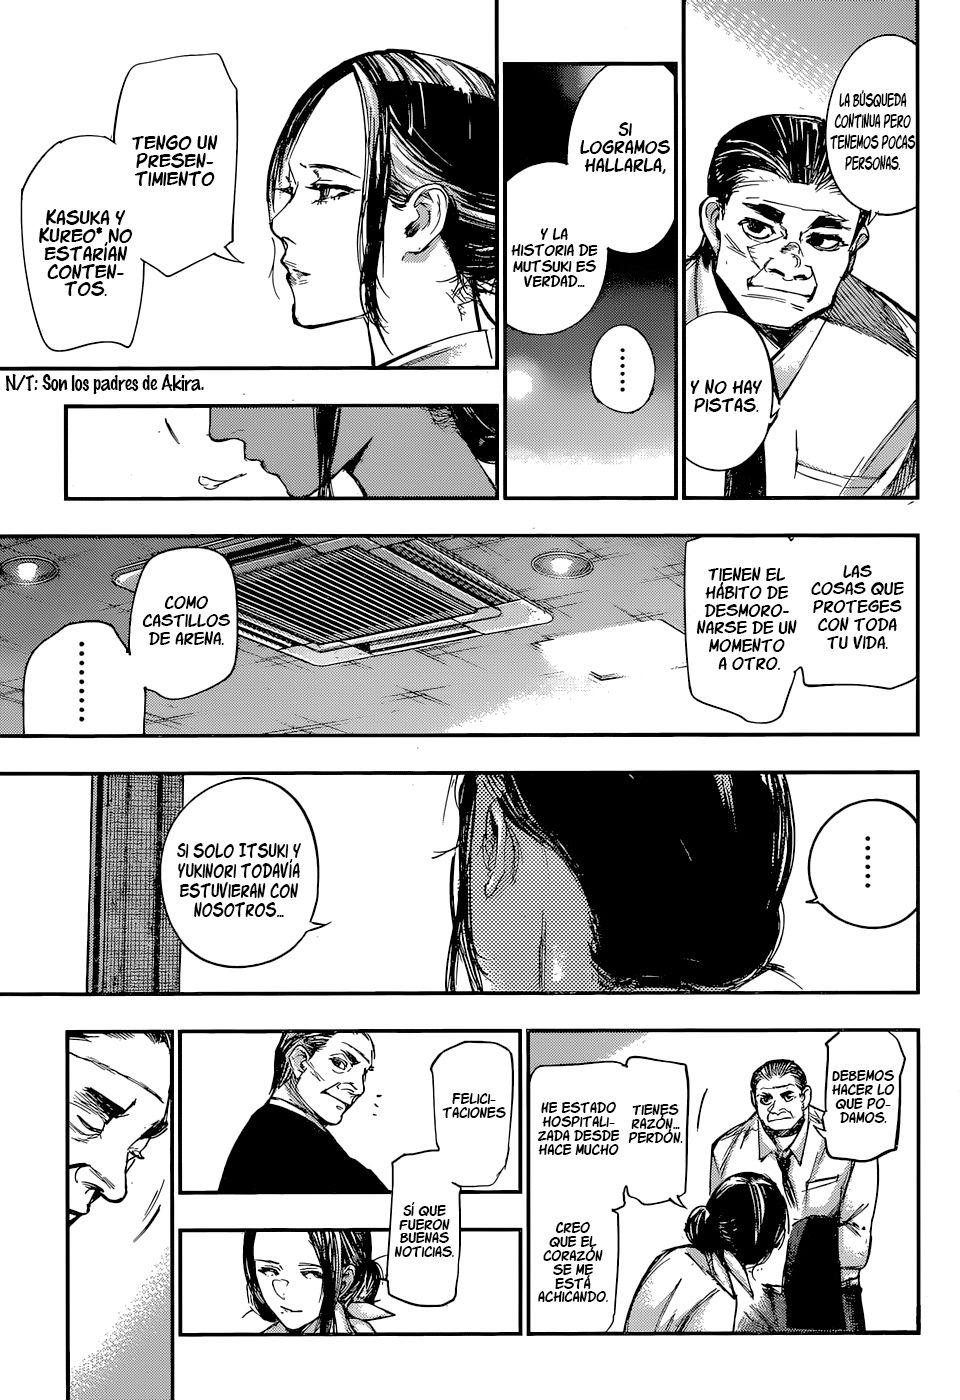 http://c5.ninemanga.com/es_manga/pic2/59/59/525294/066dac329055466b3d5094adc421744f.jpg Page 6